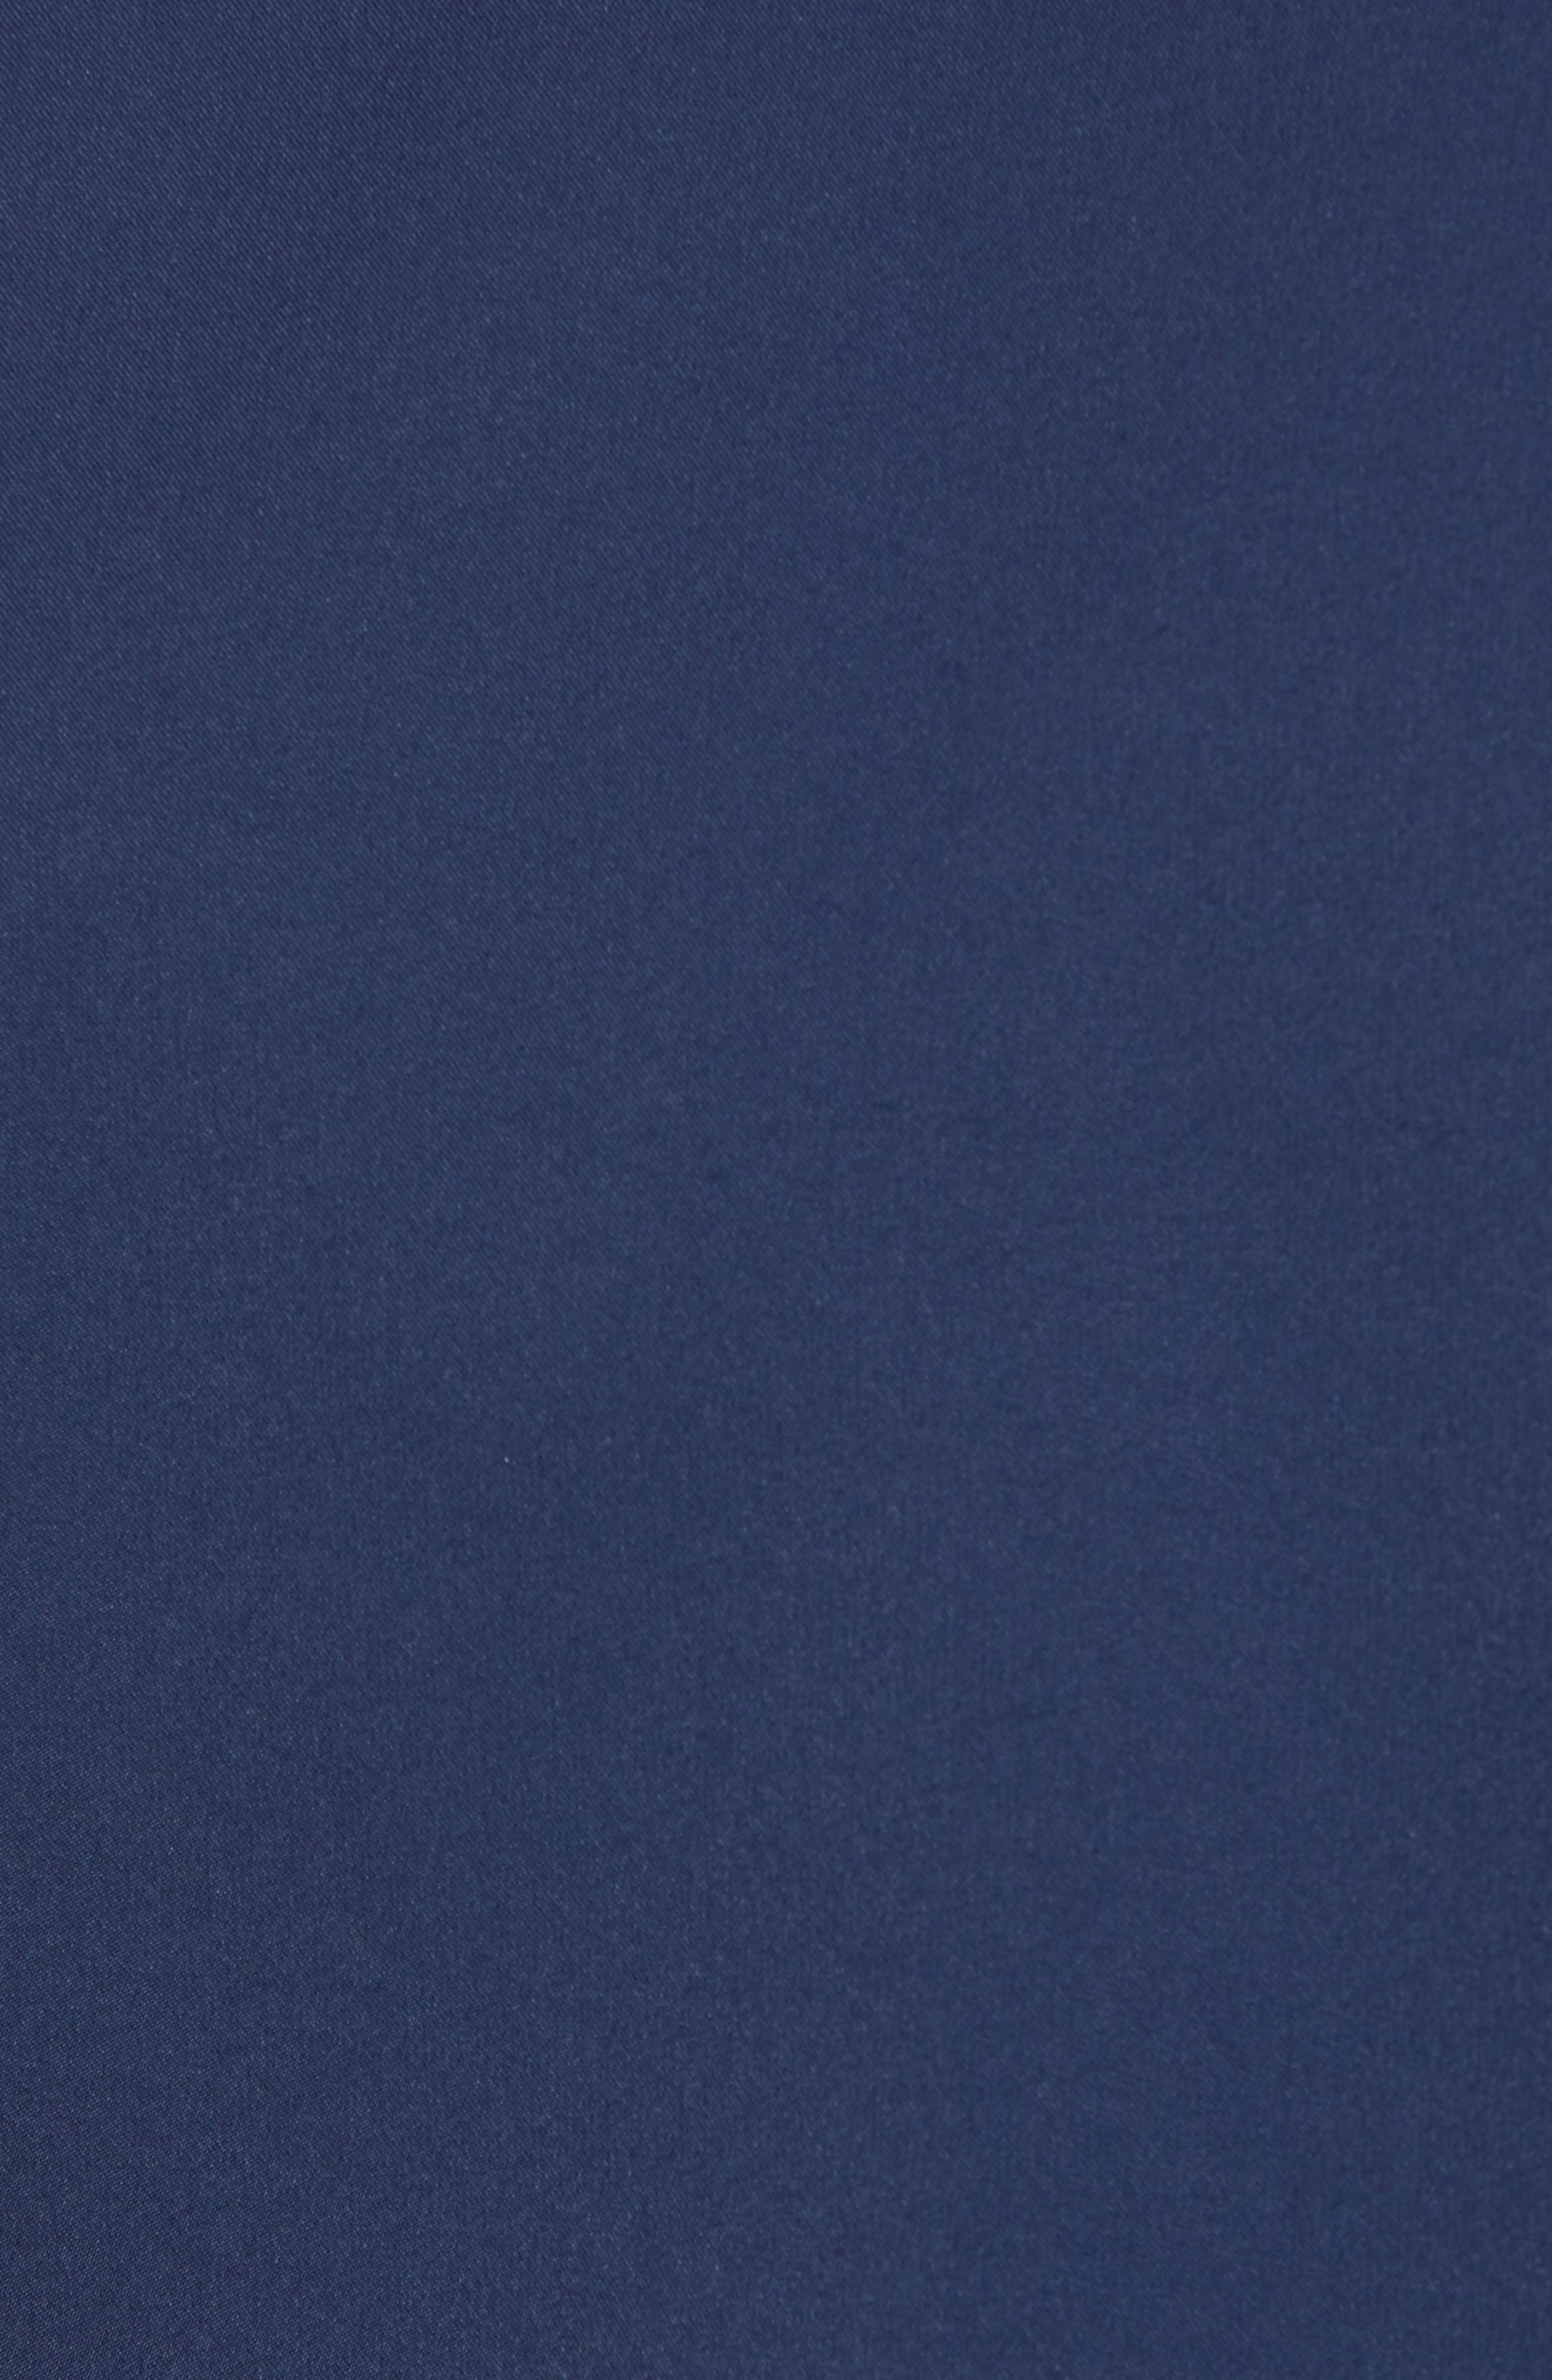 Furg HL Neoteric Bomber Jacket,                             Alternate thumbnail 6, color,                             VICTORY